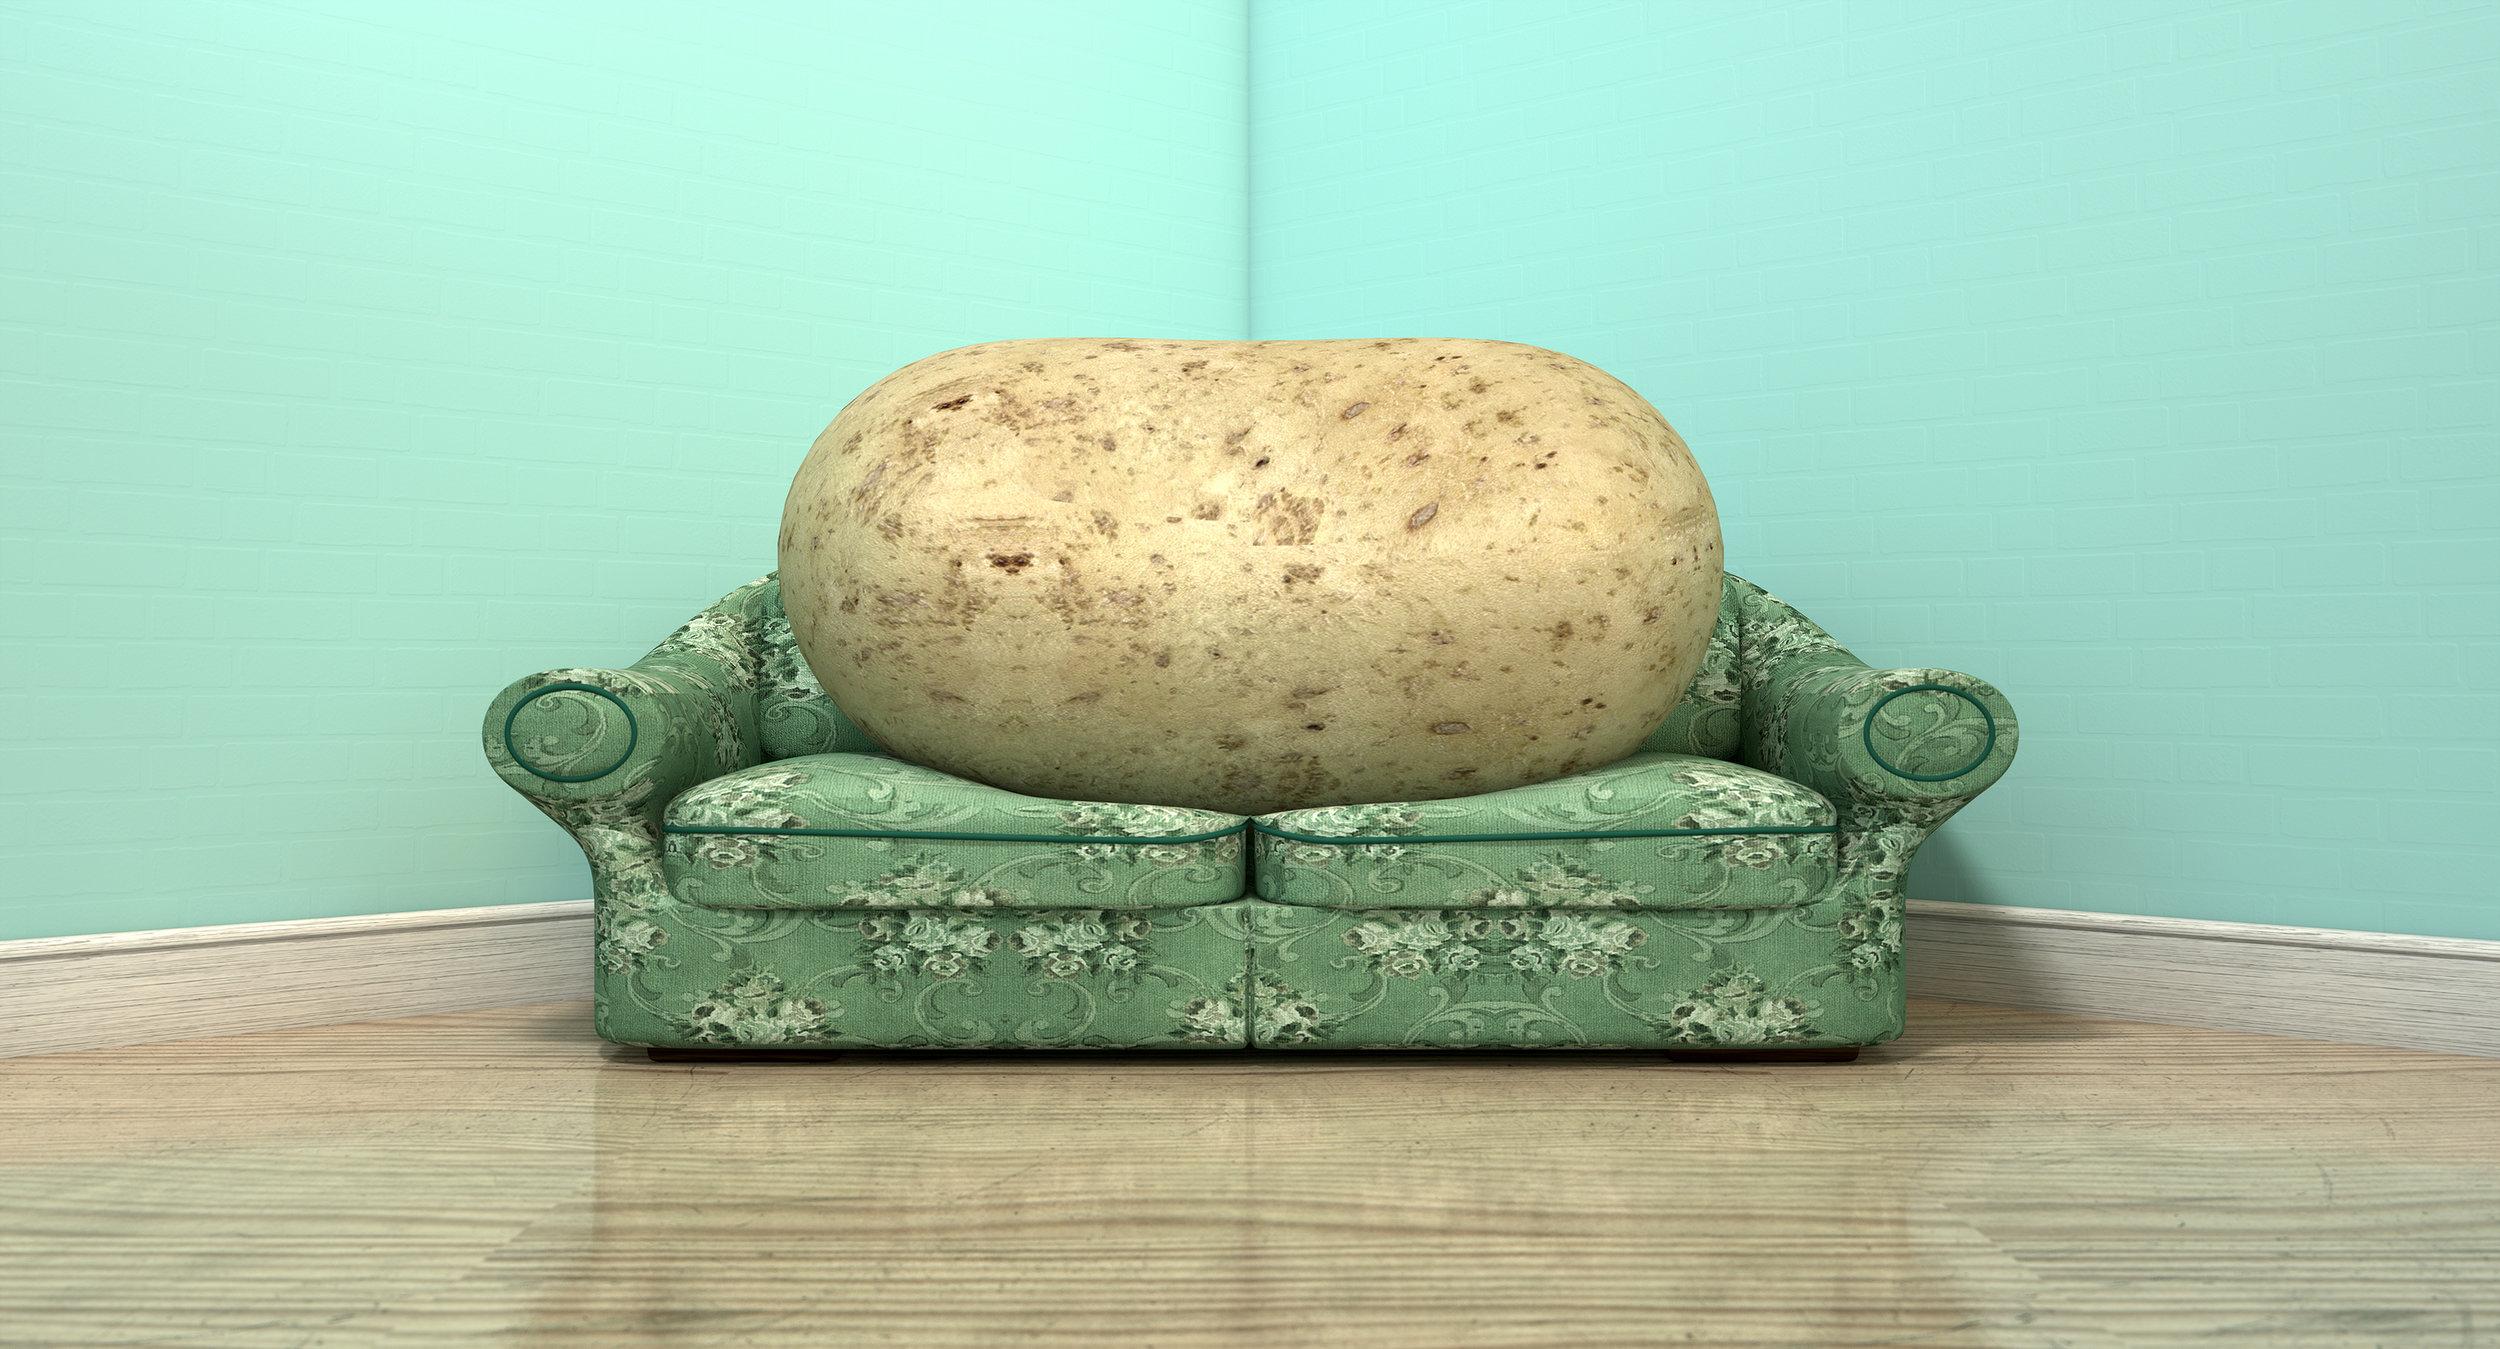 bigstock-Couch-Potato-On-Old-Sofa-76533155 2.jpg